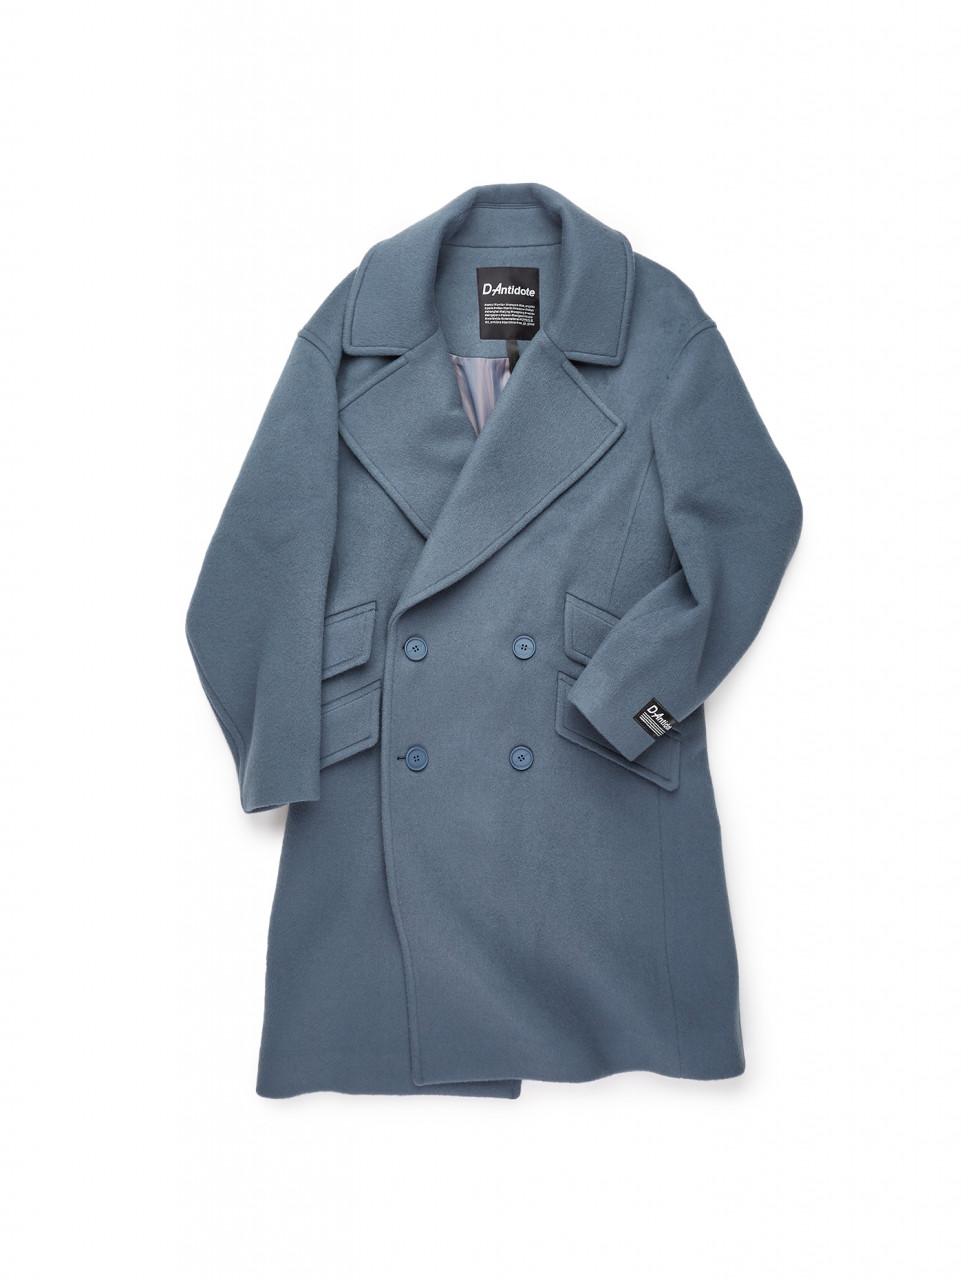 351-D20FWCT004U D-ANTIDOTE DA OVERSIZED BASIC COAT FOG BLUE